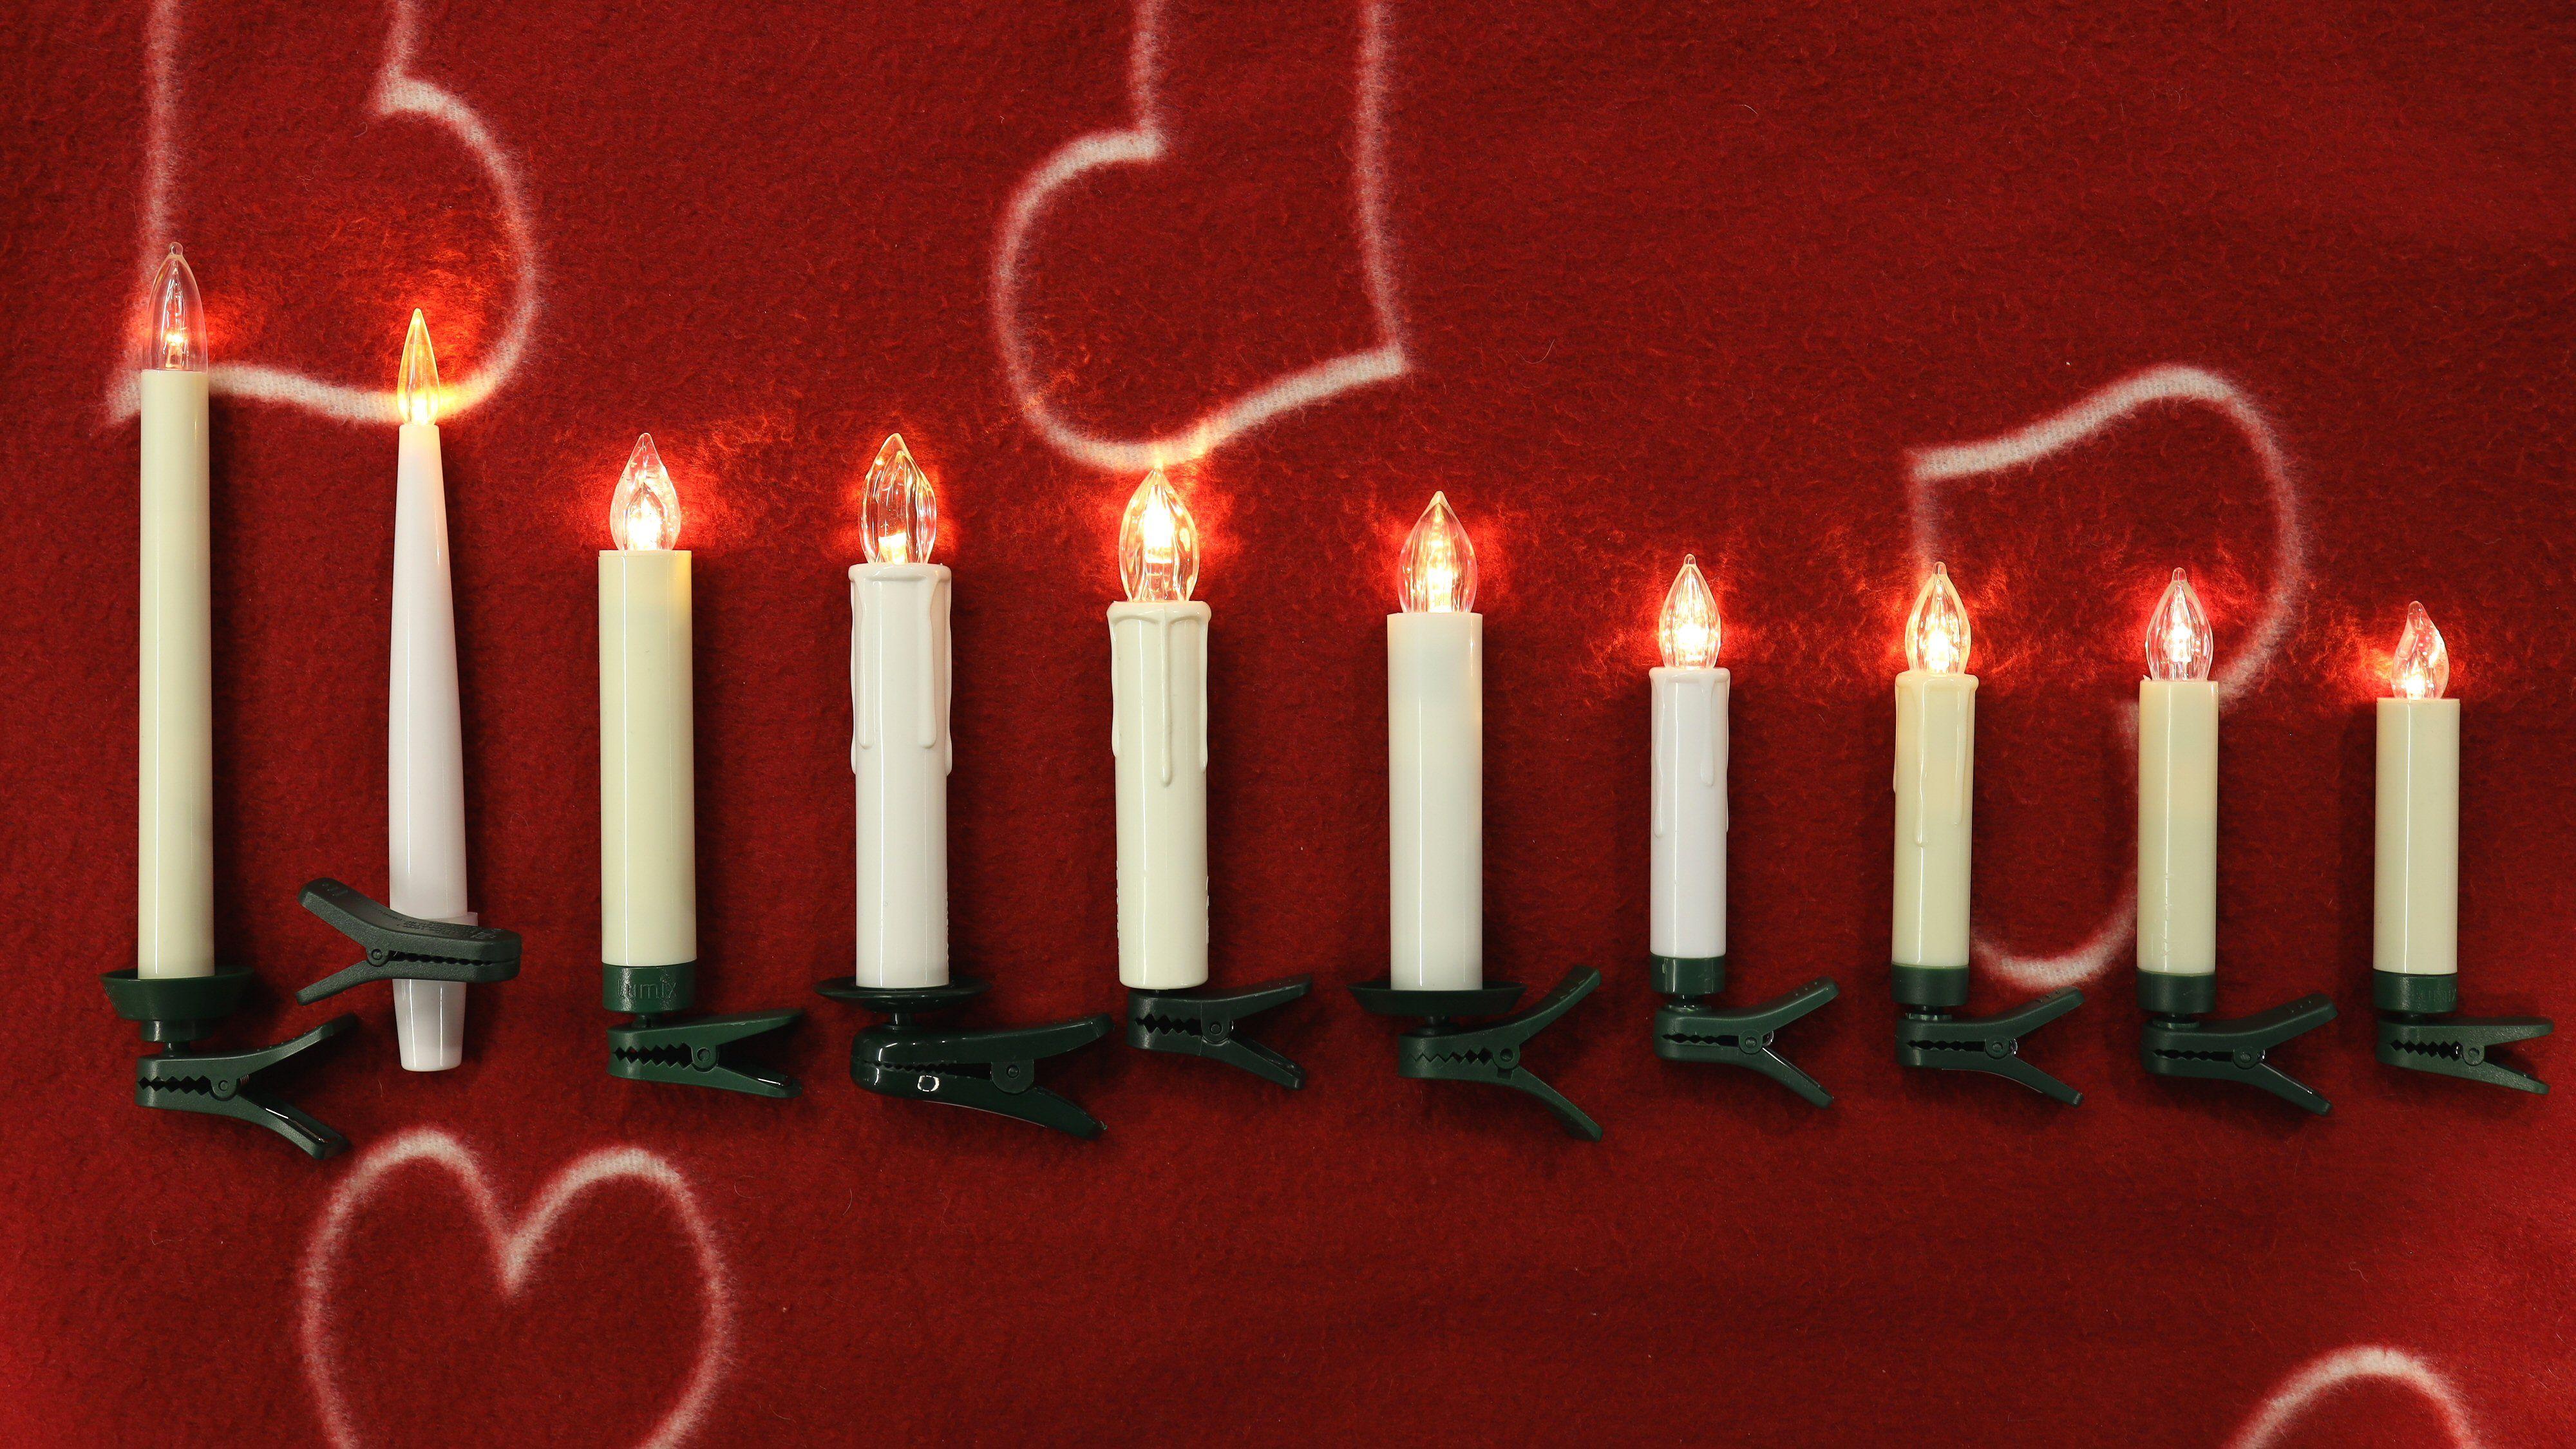 Fra venstre: Konstsmide 1920, Northlight (lange), Lumix (standard), Rusta (AA-størrelse), Kulz, Northlight (AA-størrelse), Rusta (AAA-størrelse), Star-Max, Anslut og Lumix Mini.